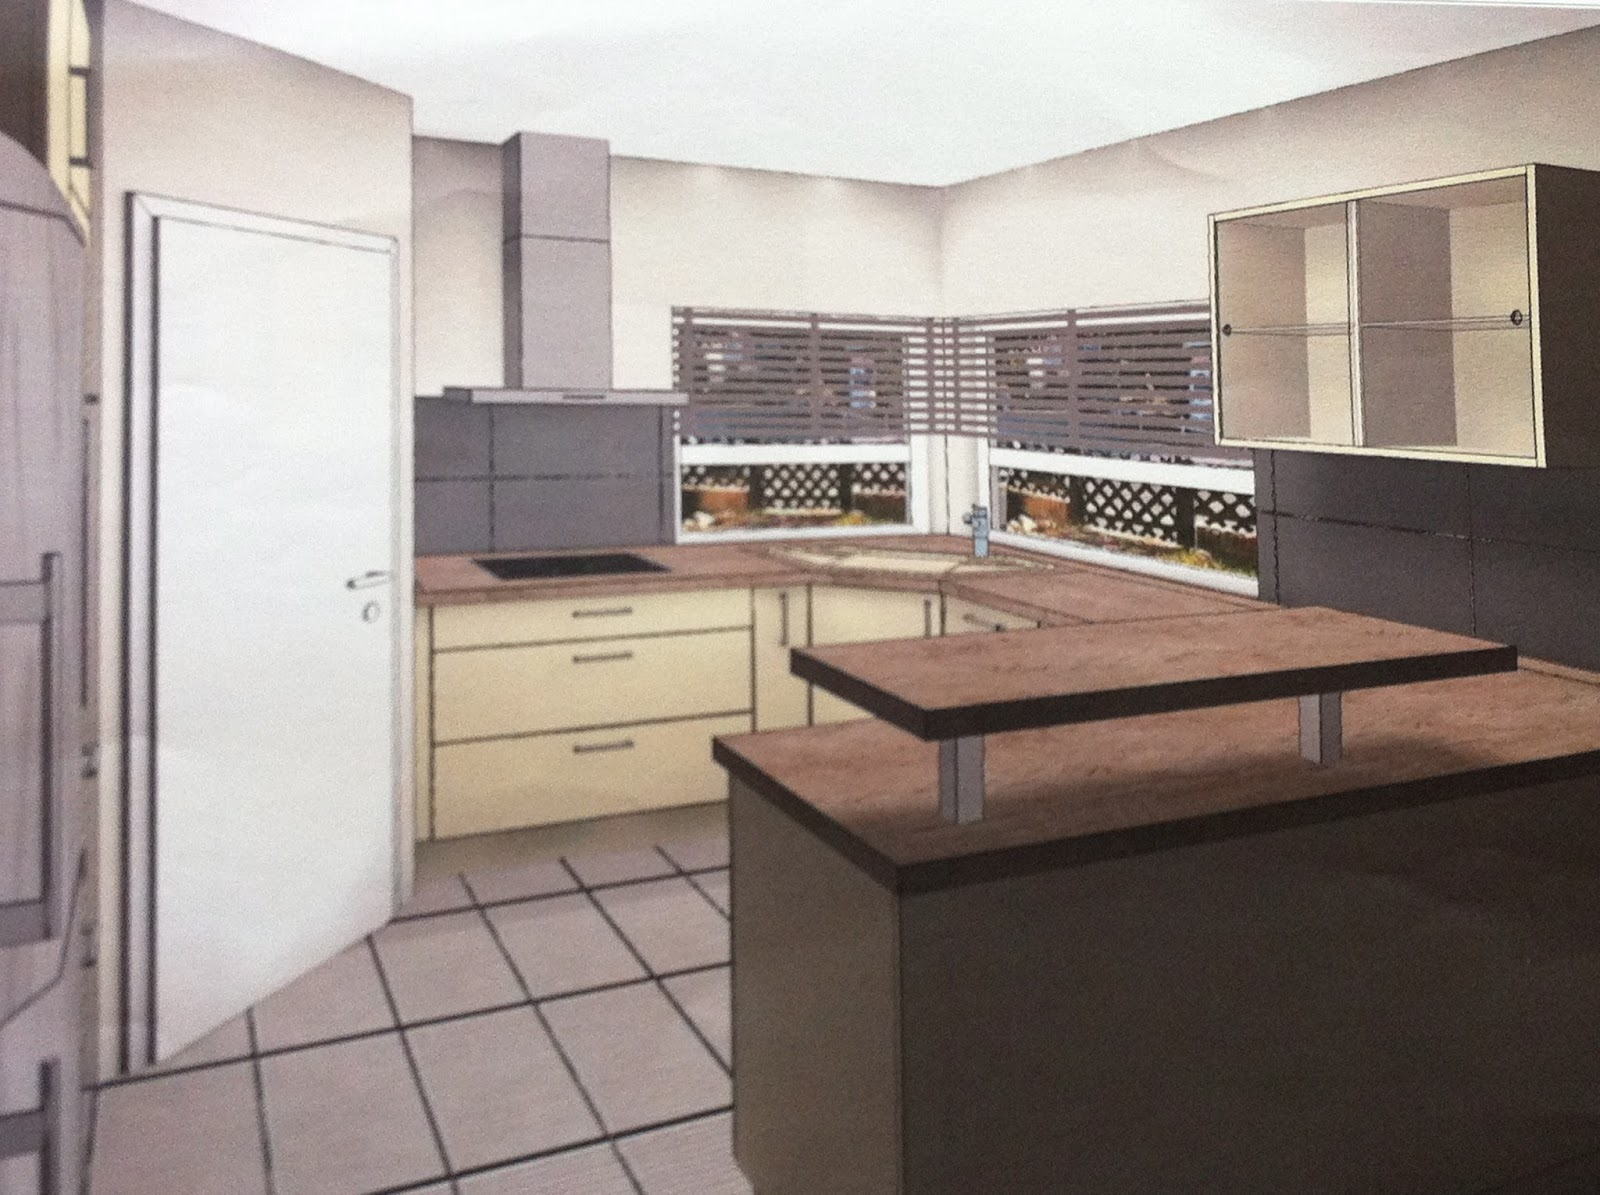 Hausbau von Dani, Markus & Lenny: Küchenplanung Teil 2